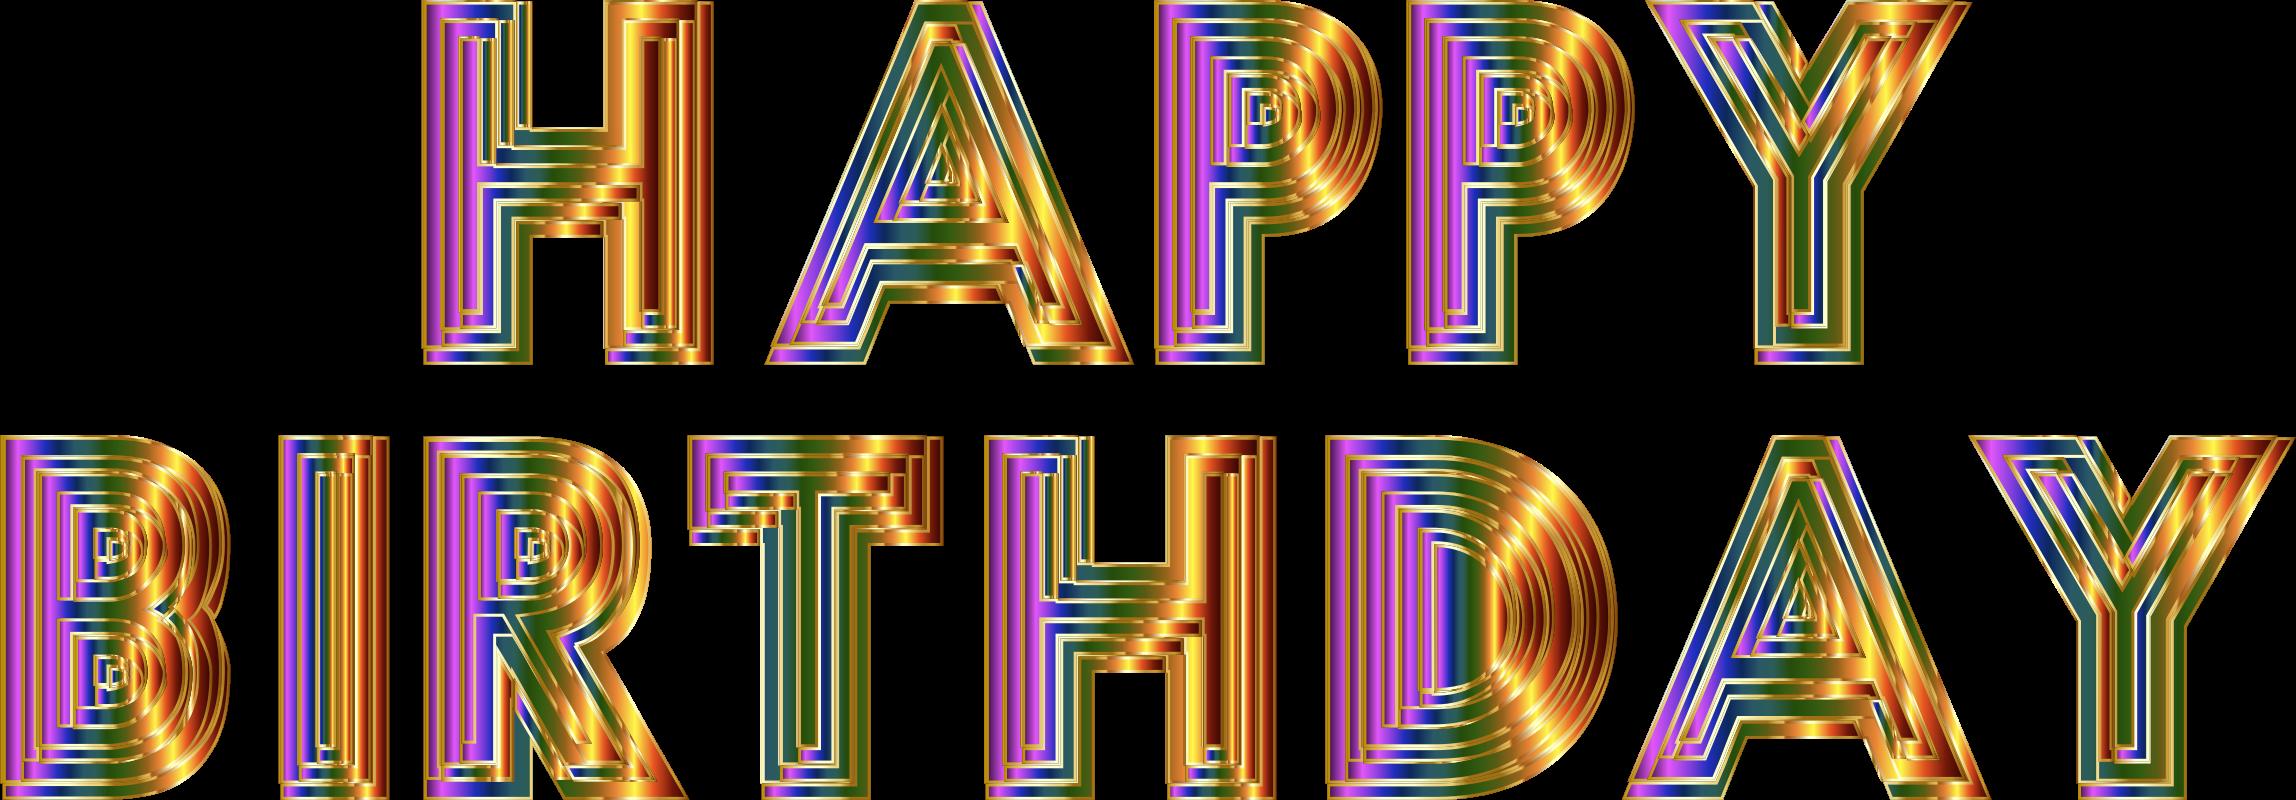 Cliparts zum geburtstag kostenlos banner free library Clipart - Happy Birthday Typography 6 banner free library